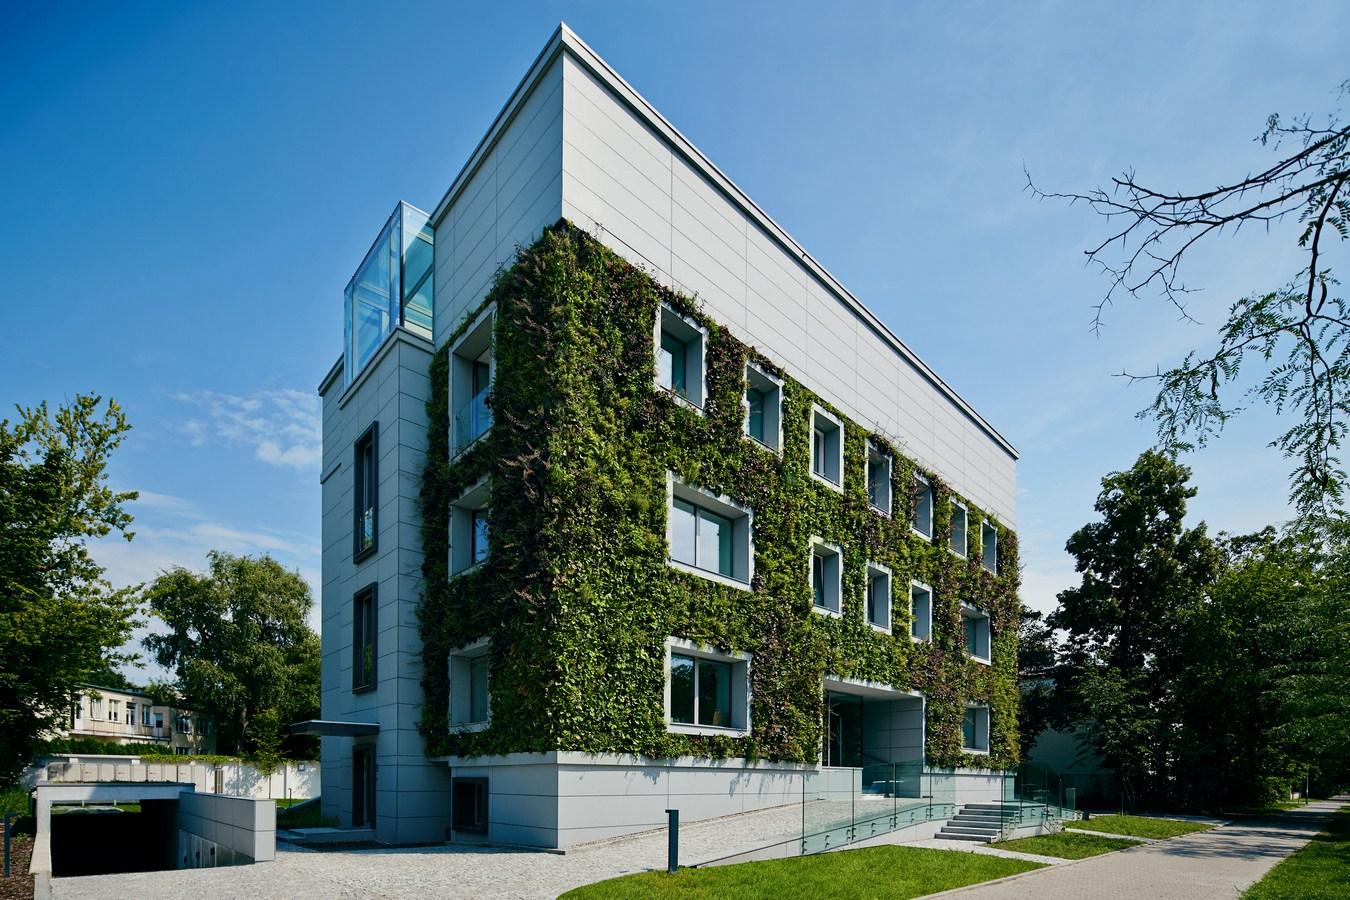 Foundation For Polish Science By FAAB Architektura - Sheet